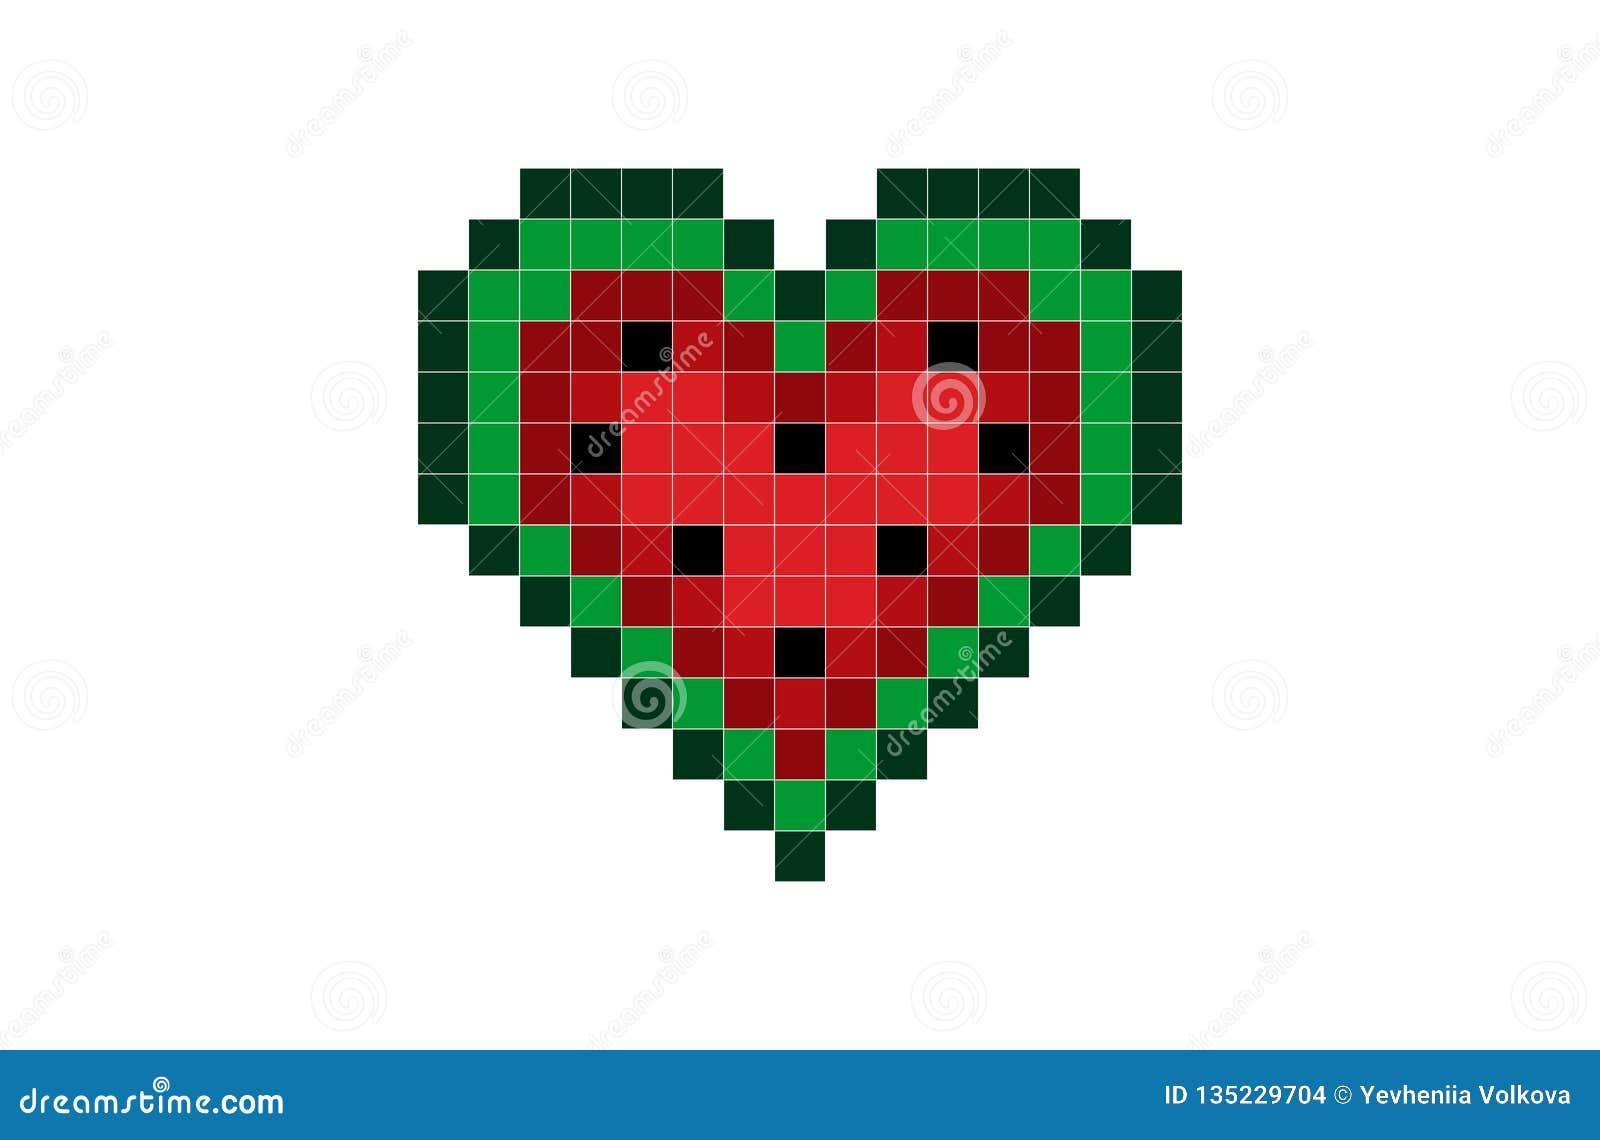 Watermelon Pixel Stock Illustrations 292 Watermelon Pixel Stock Illustrations Vectors Clipart Dreamstime